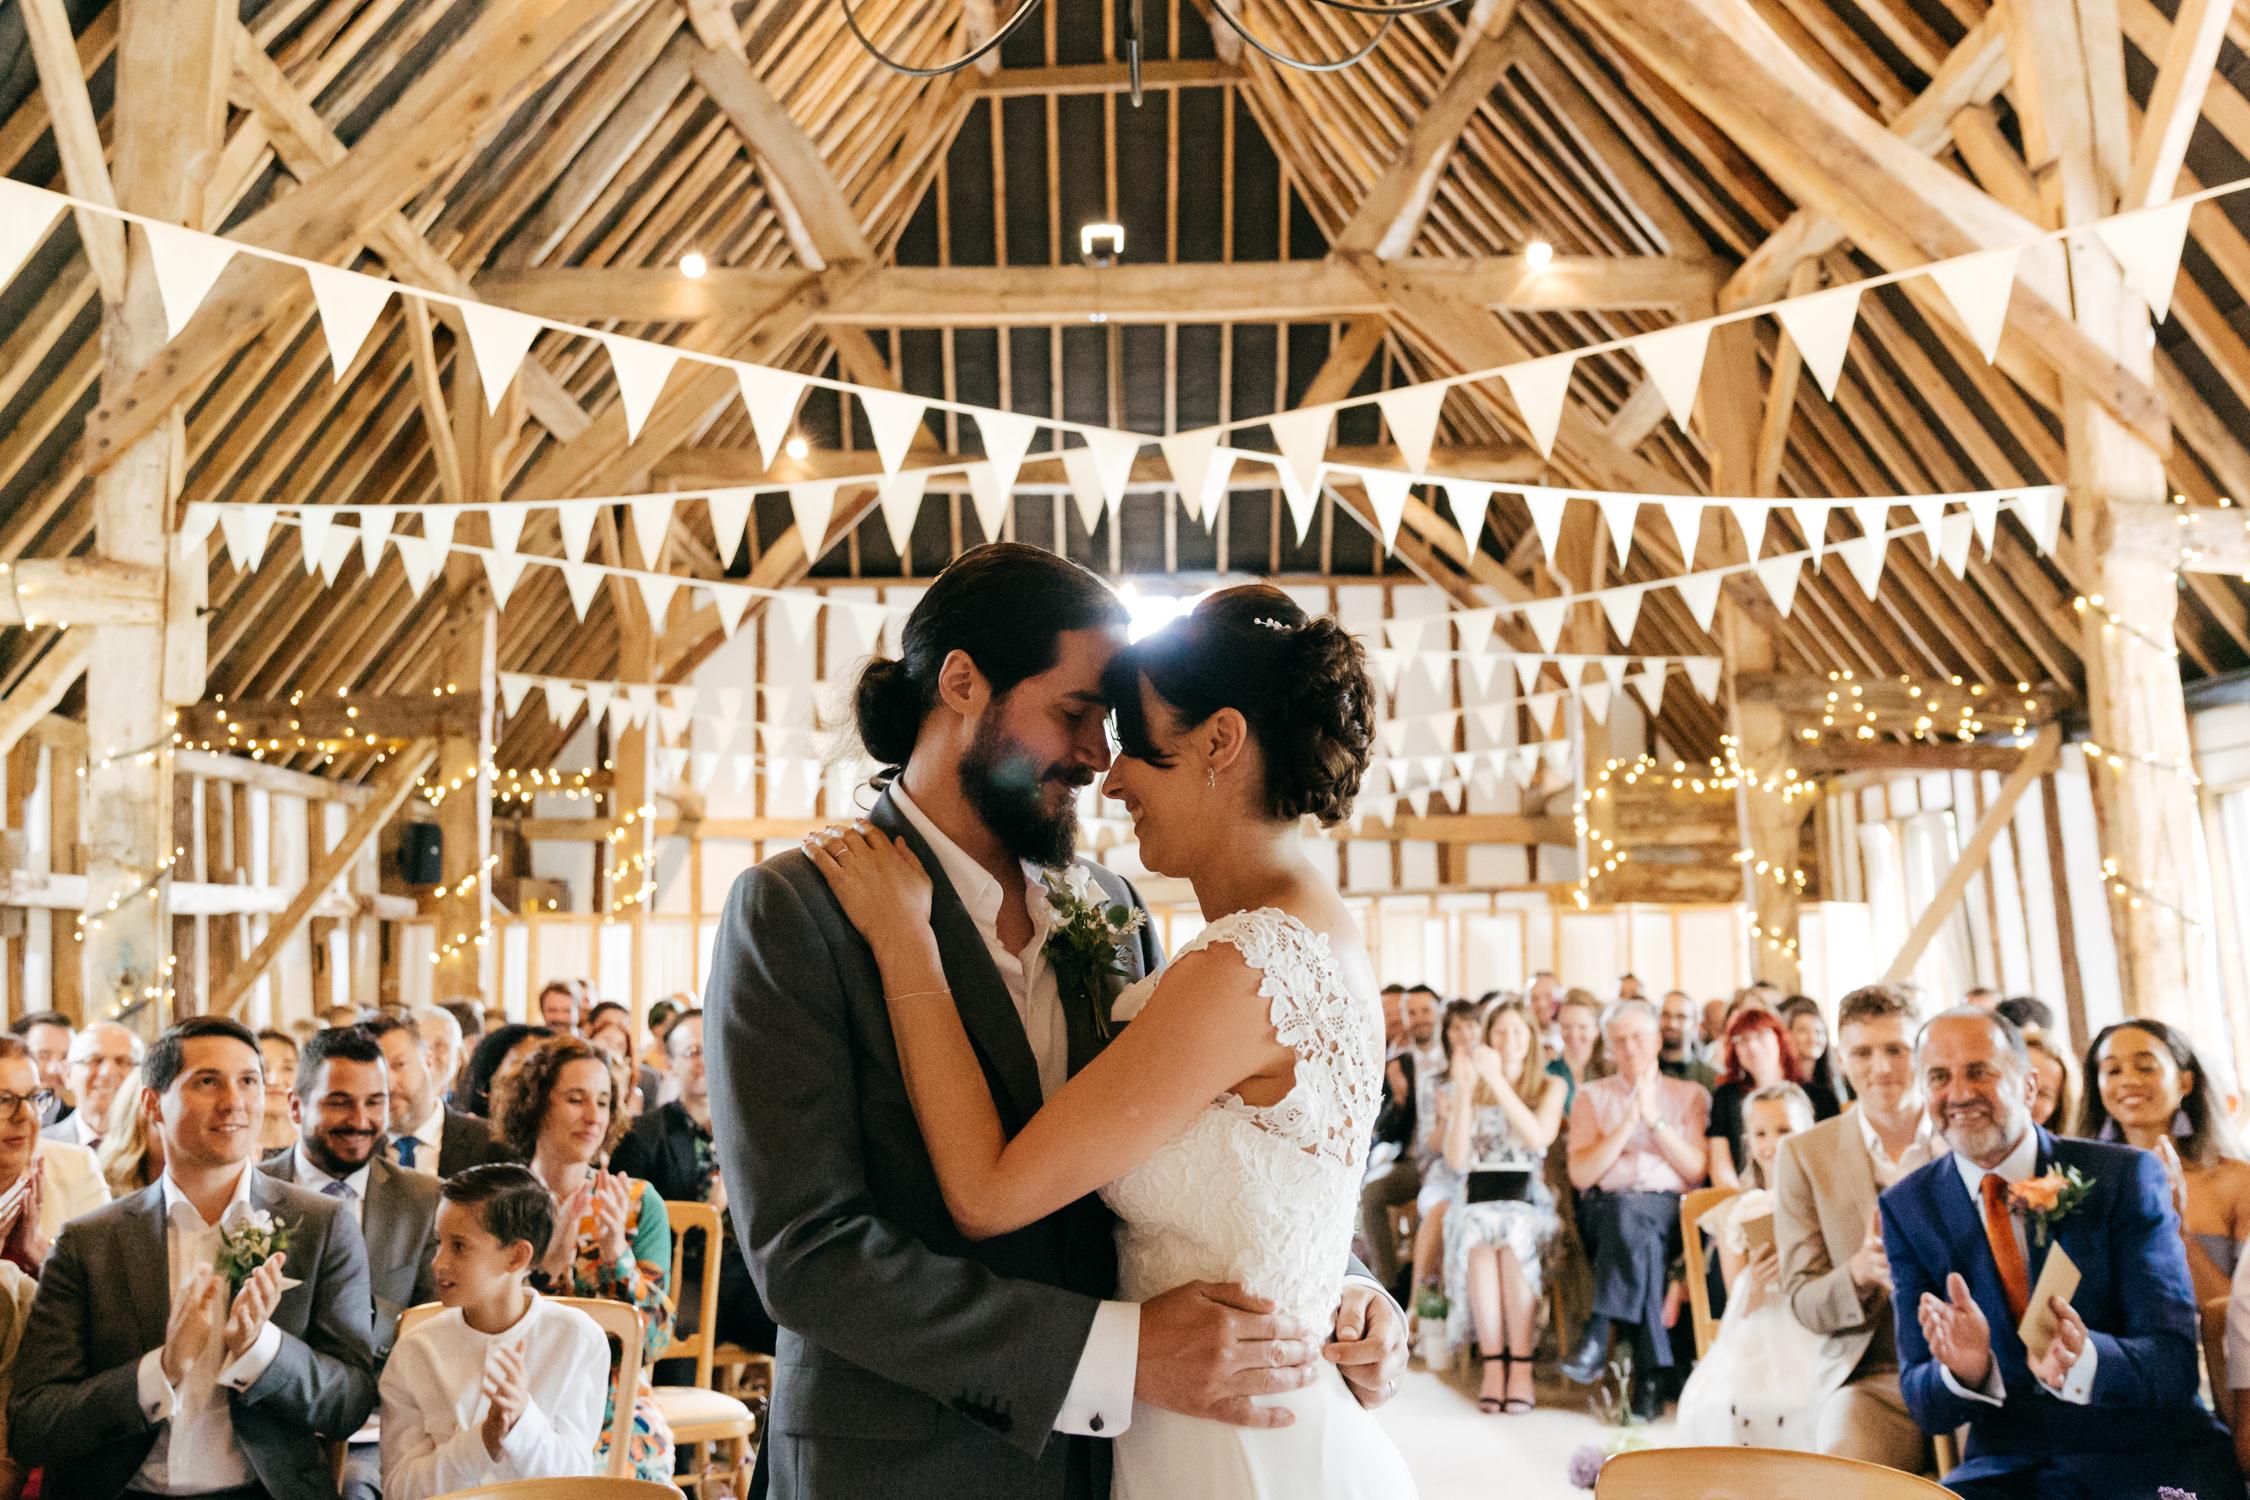 candid wedding photo of wedding ceremony at clock barn